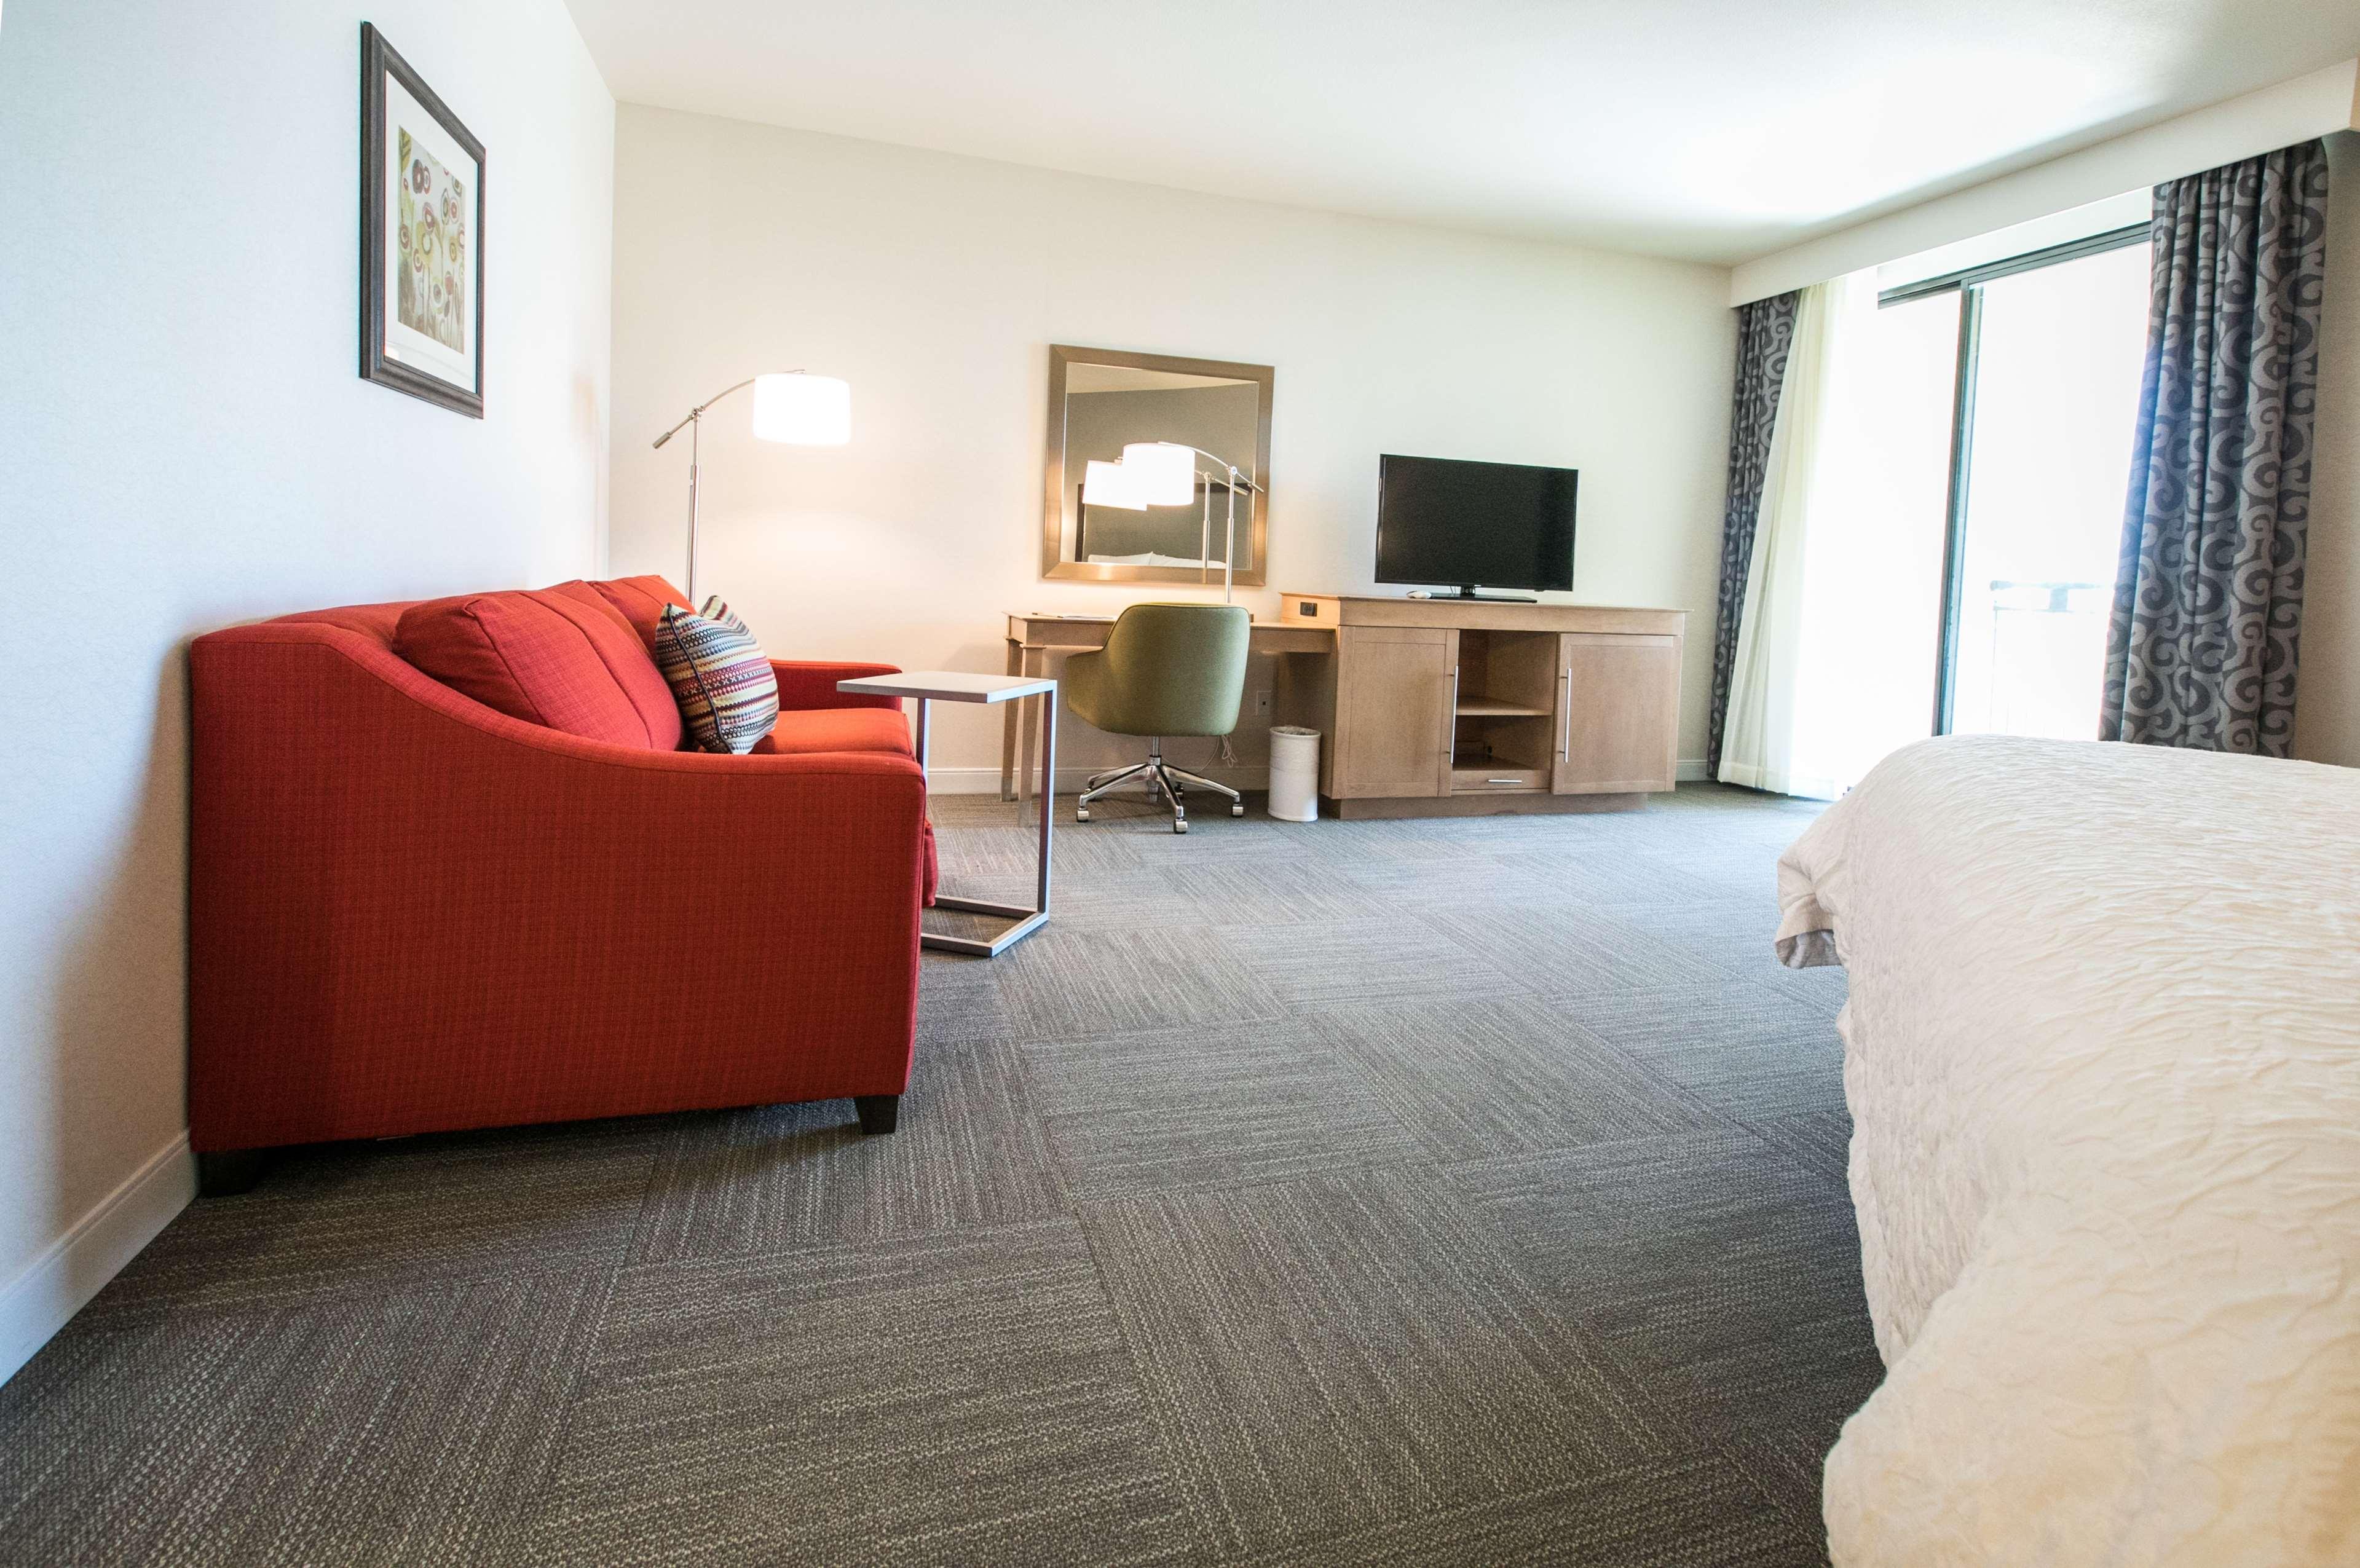 Hampton Inn & Suites Tempe - Phoenix Airport image 31